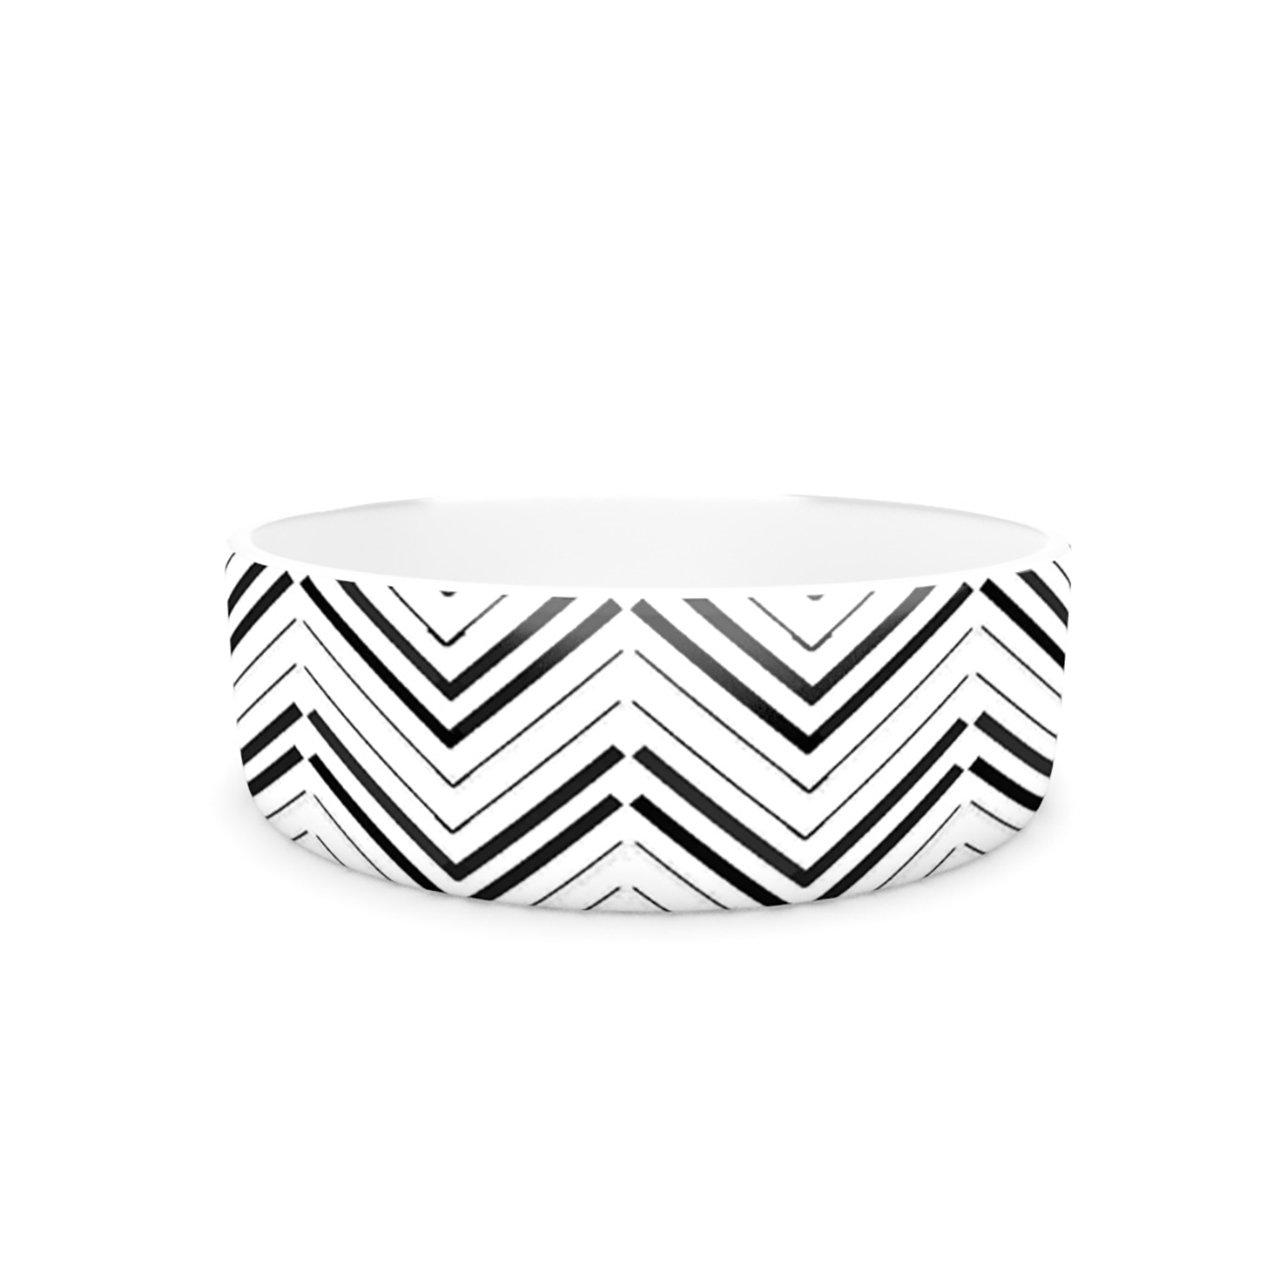 Kess InHouse CarolLynn Tice Distinct  Pet Bowl, 7-Inch, Black White